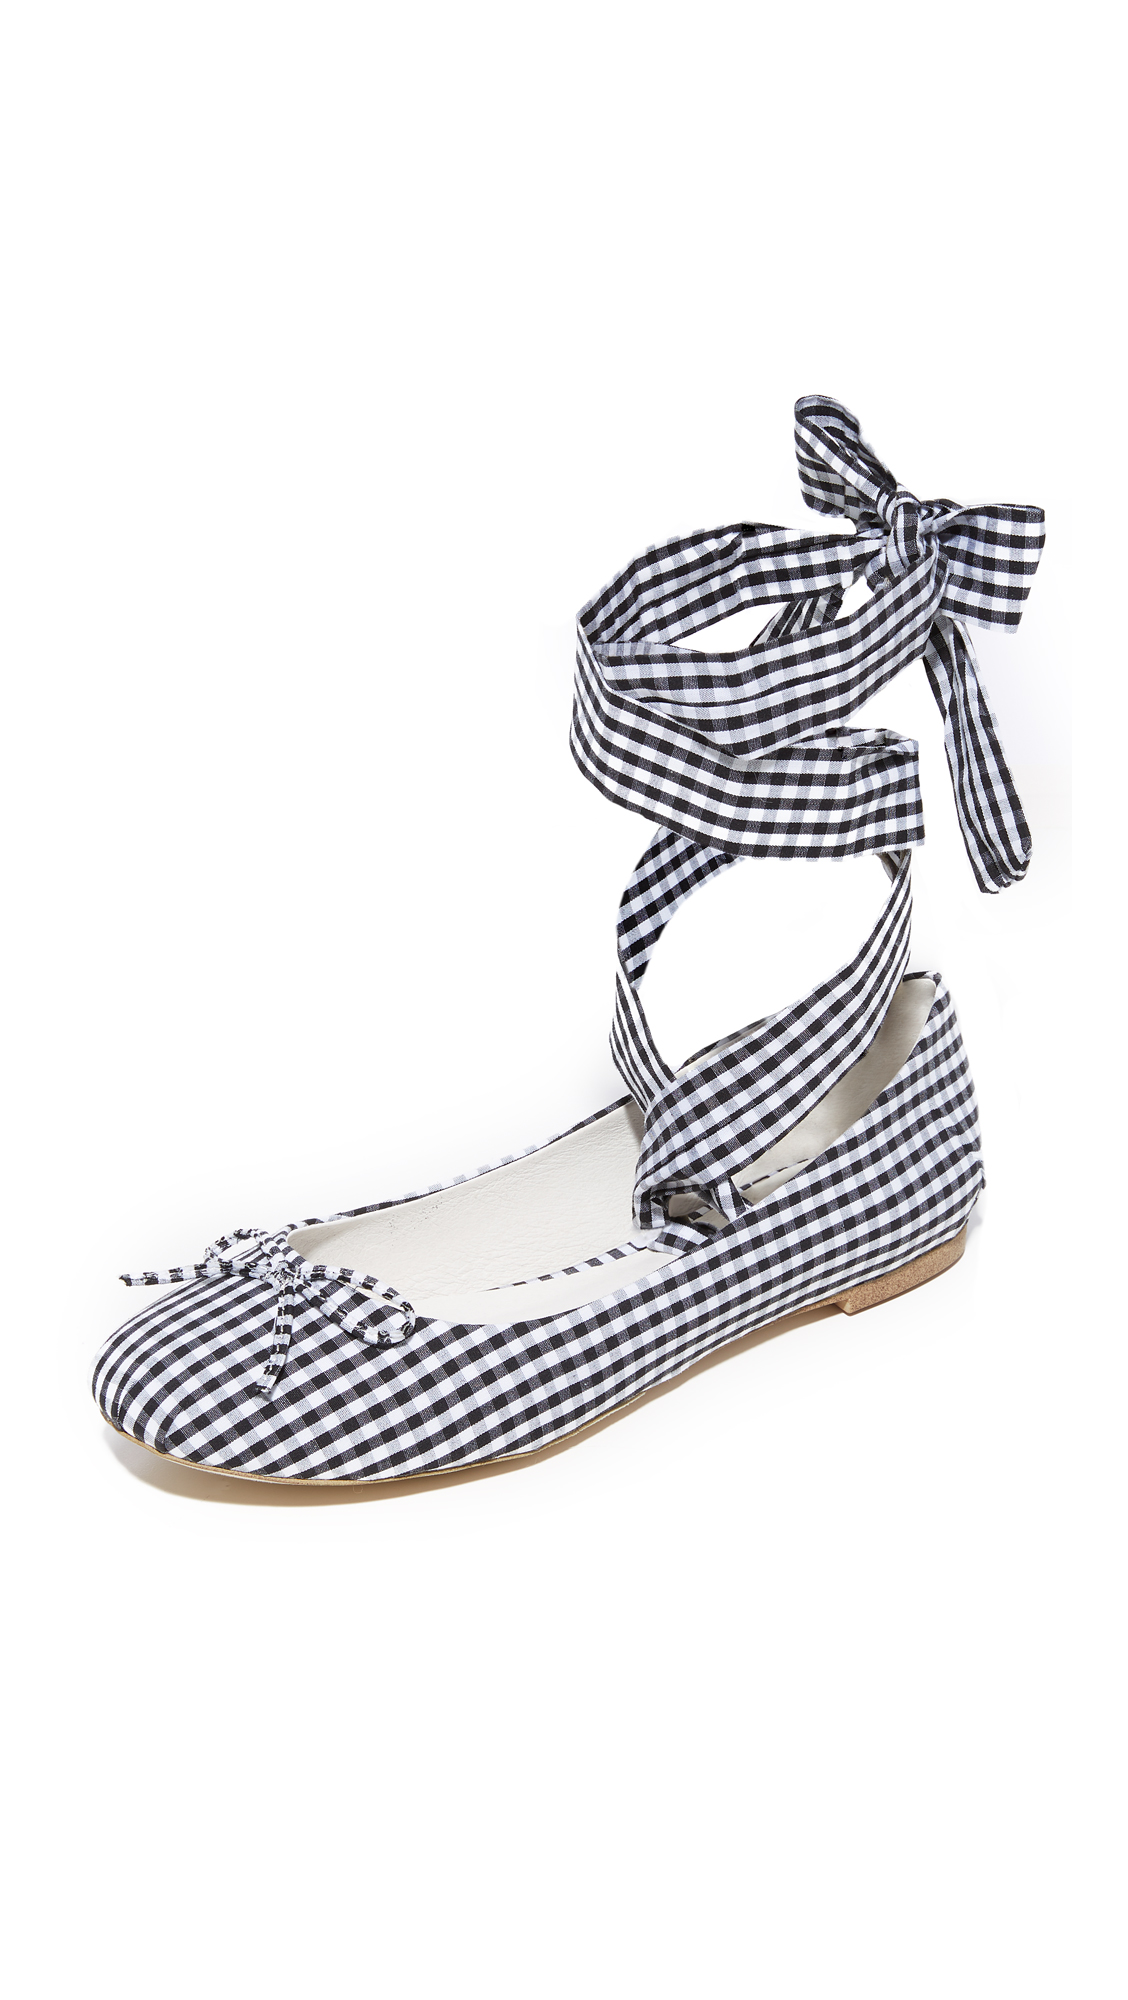 Jeffrey Campbell Sarine Tie Ballet Flats - Black Gingham